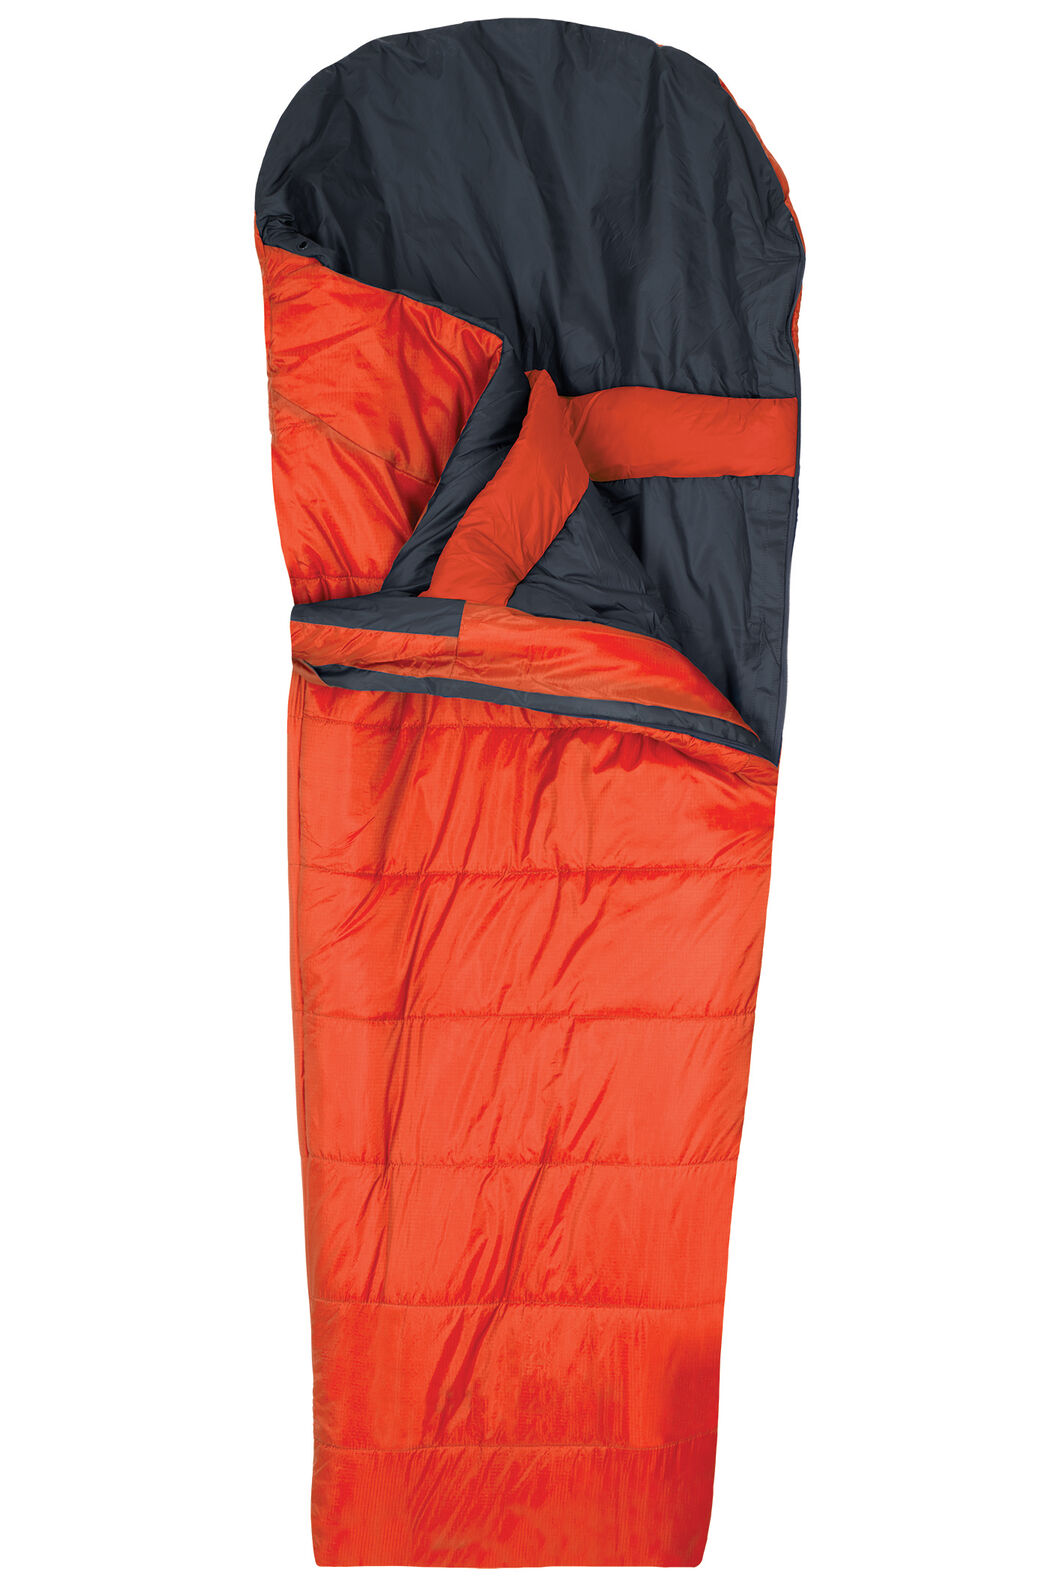 Macpac Roam 150 Synthetic VapourLite™ Sleeping Bag - Kid's, Poinciana, hi-res